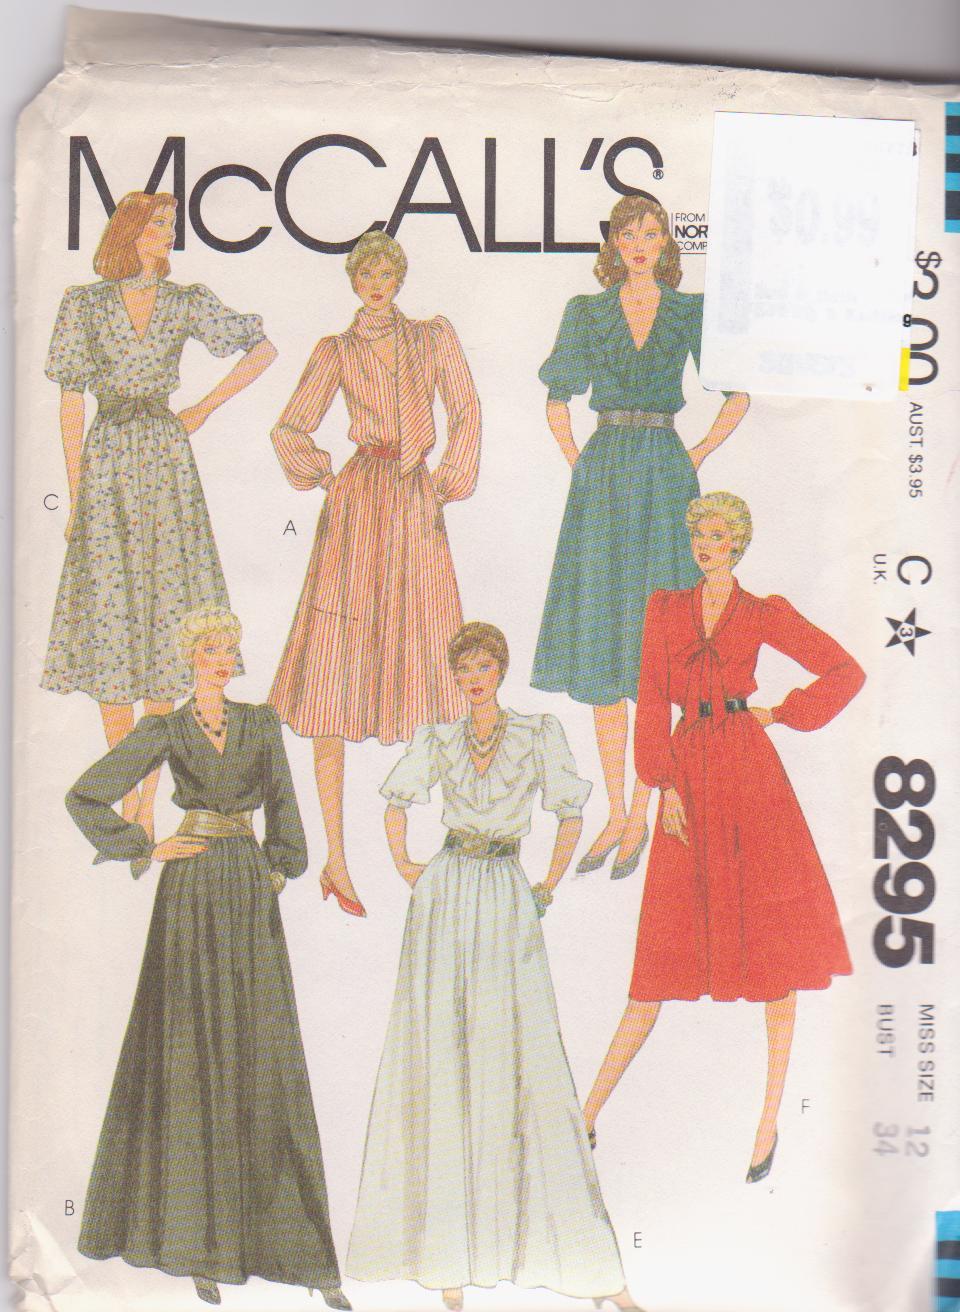 McCall's 8295 A